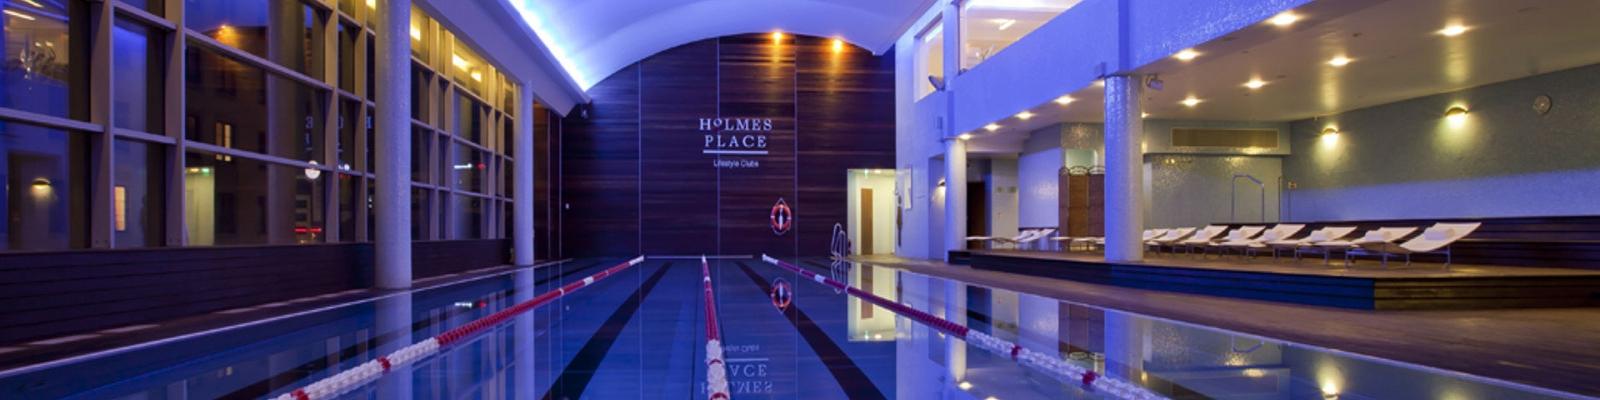 Premium Hotel Hilton | Holmes Place warszawa